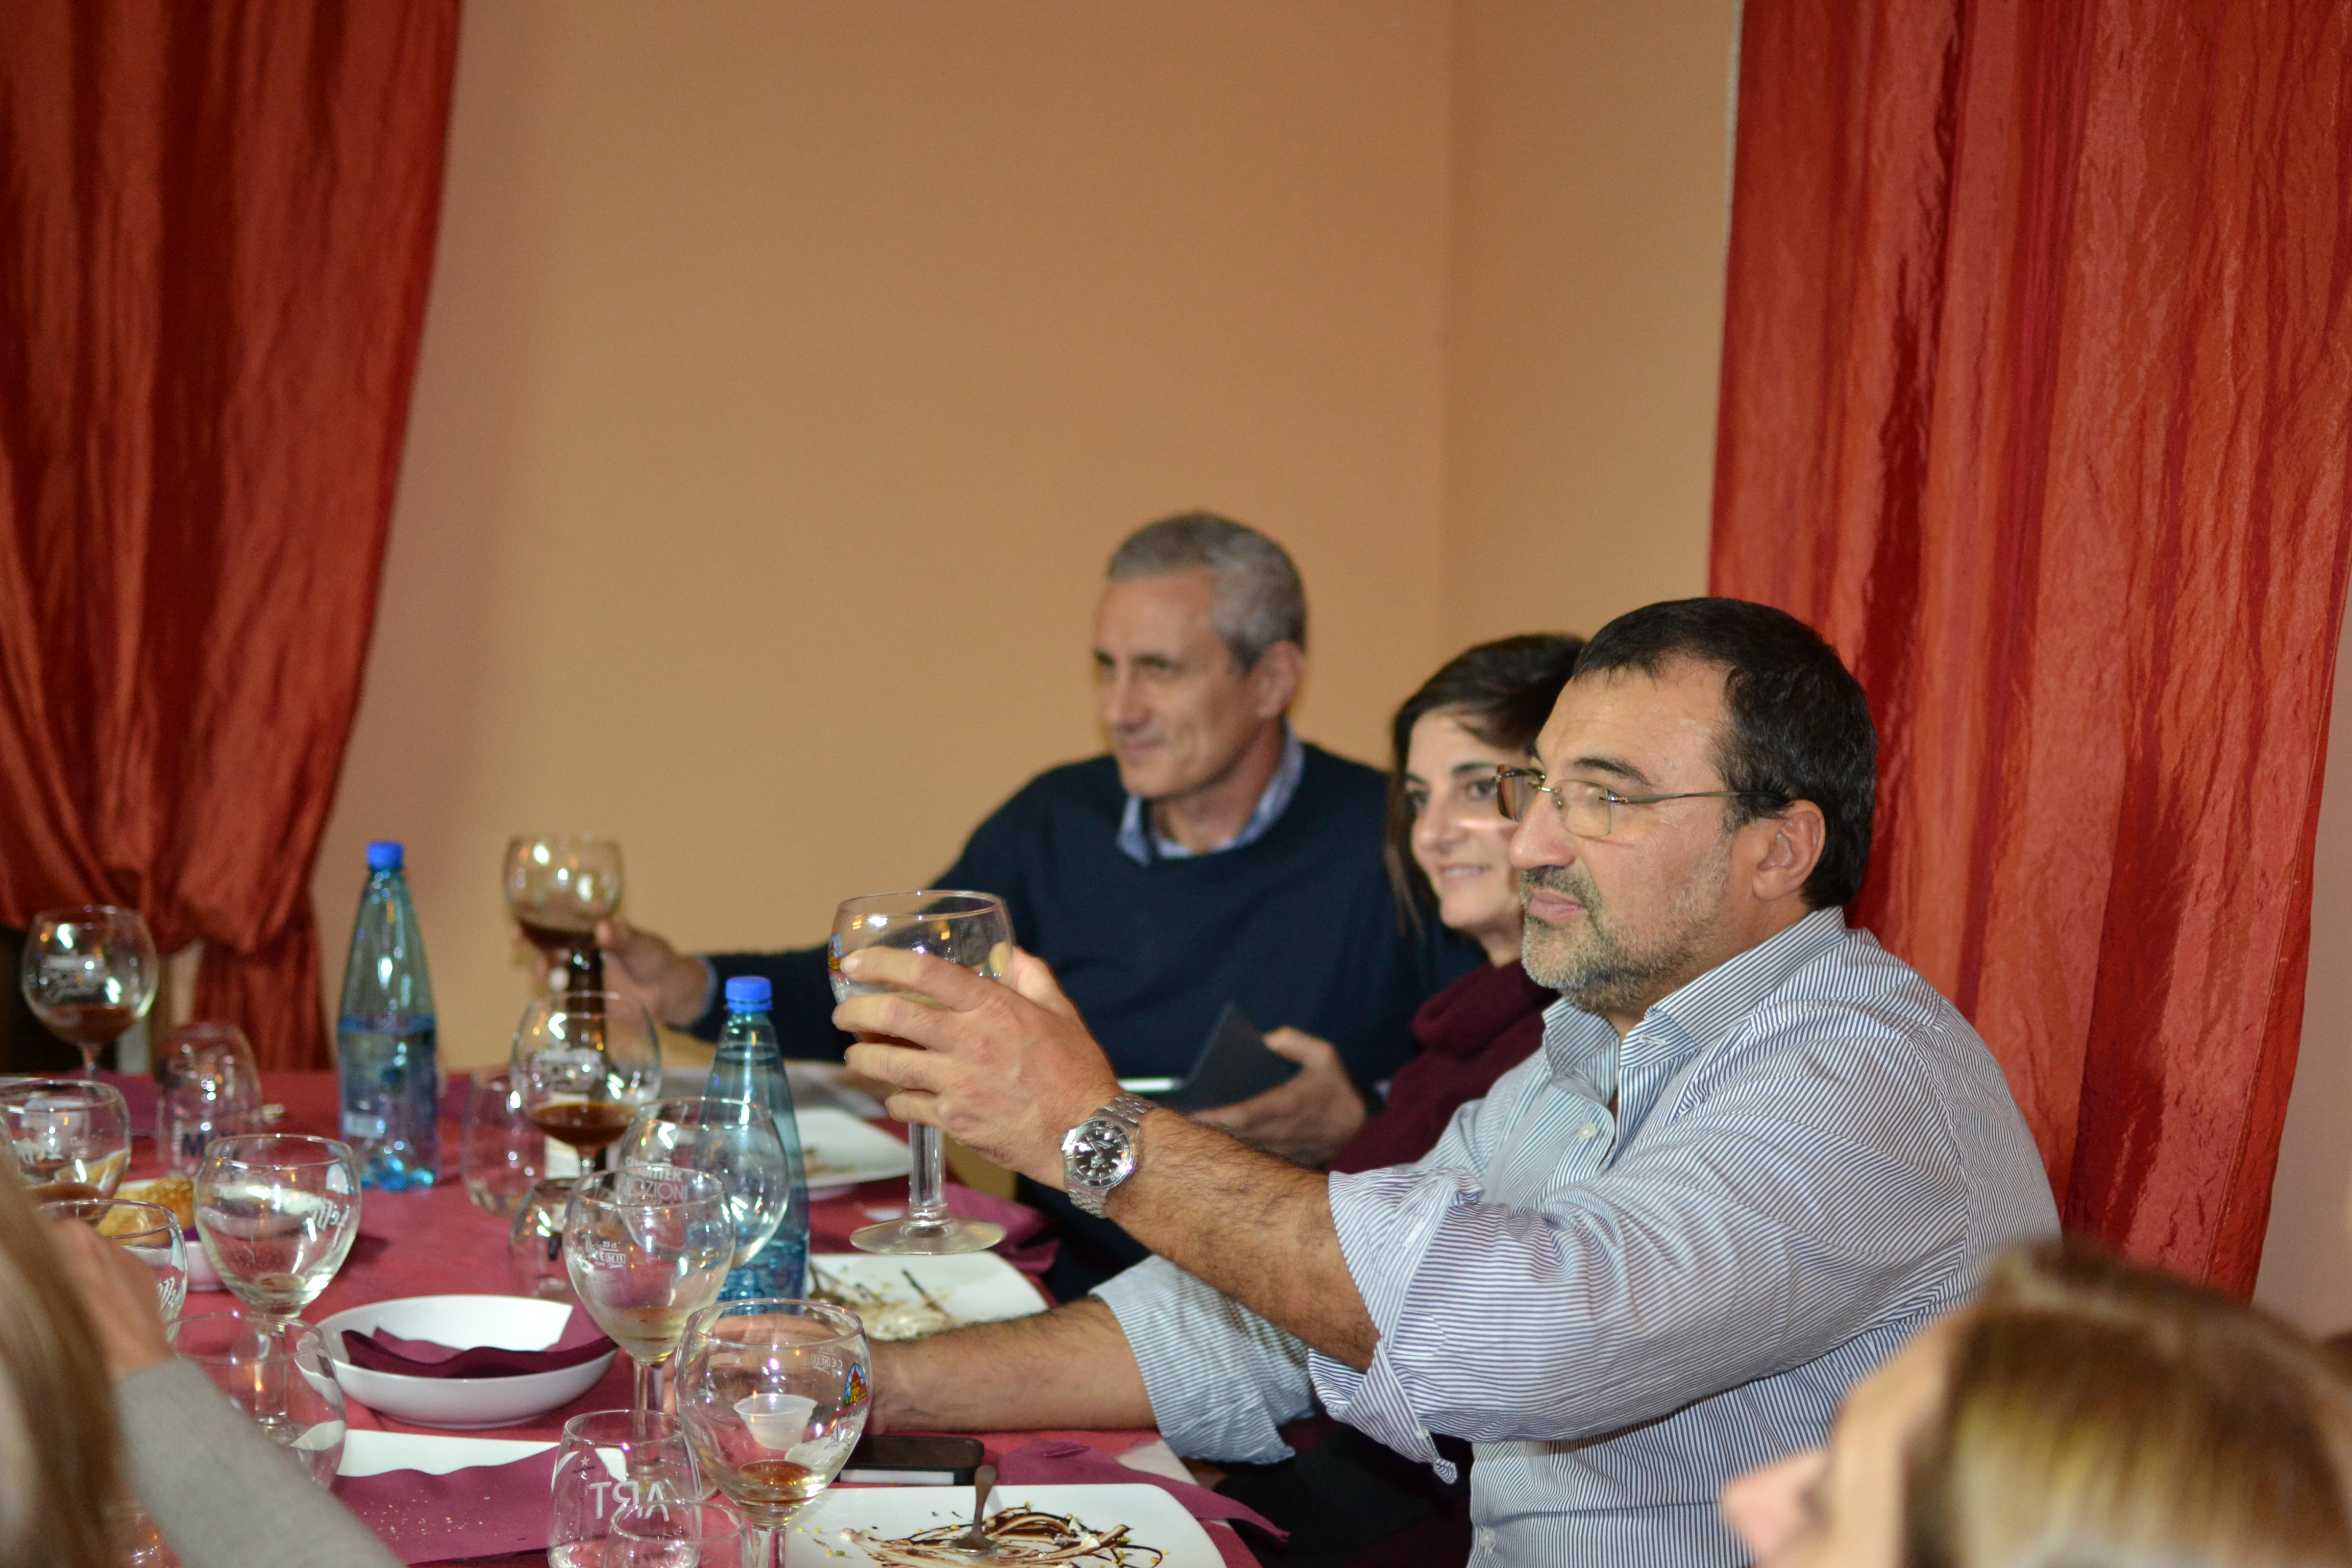 cena degustazione birraria (154)